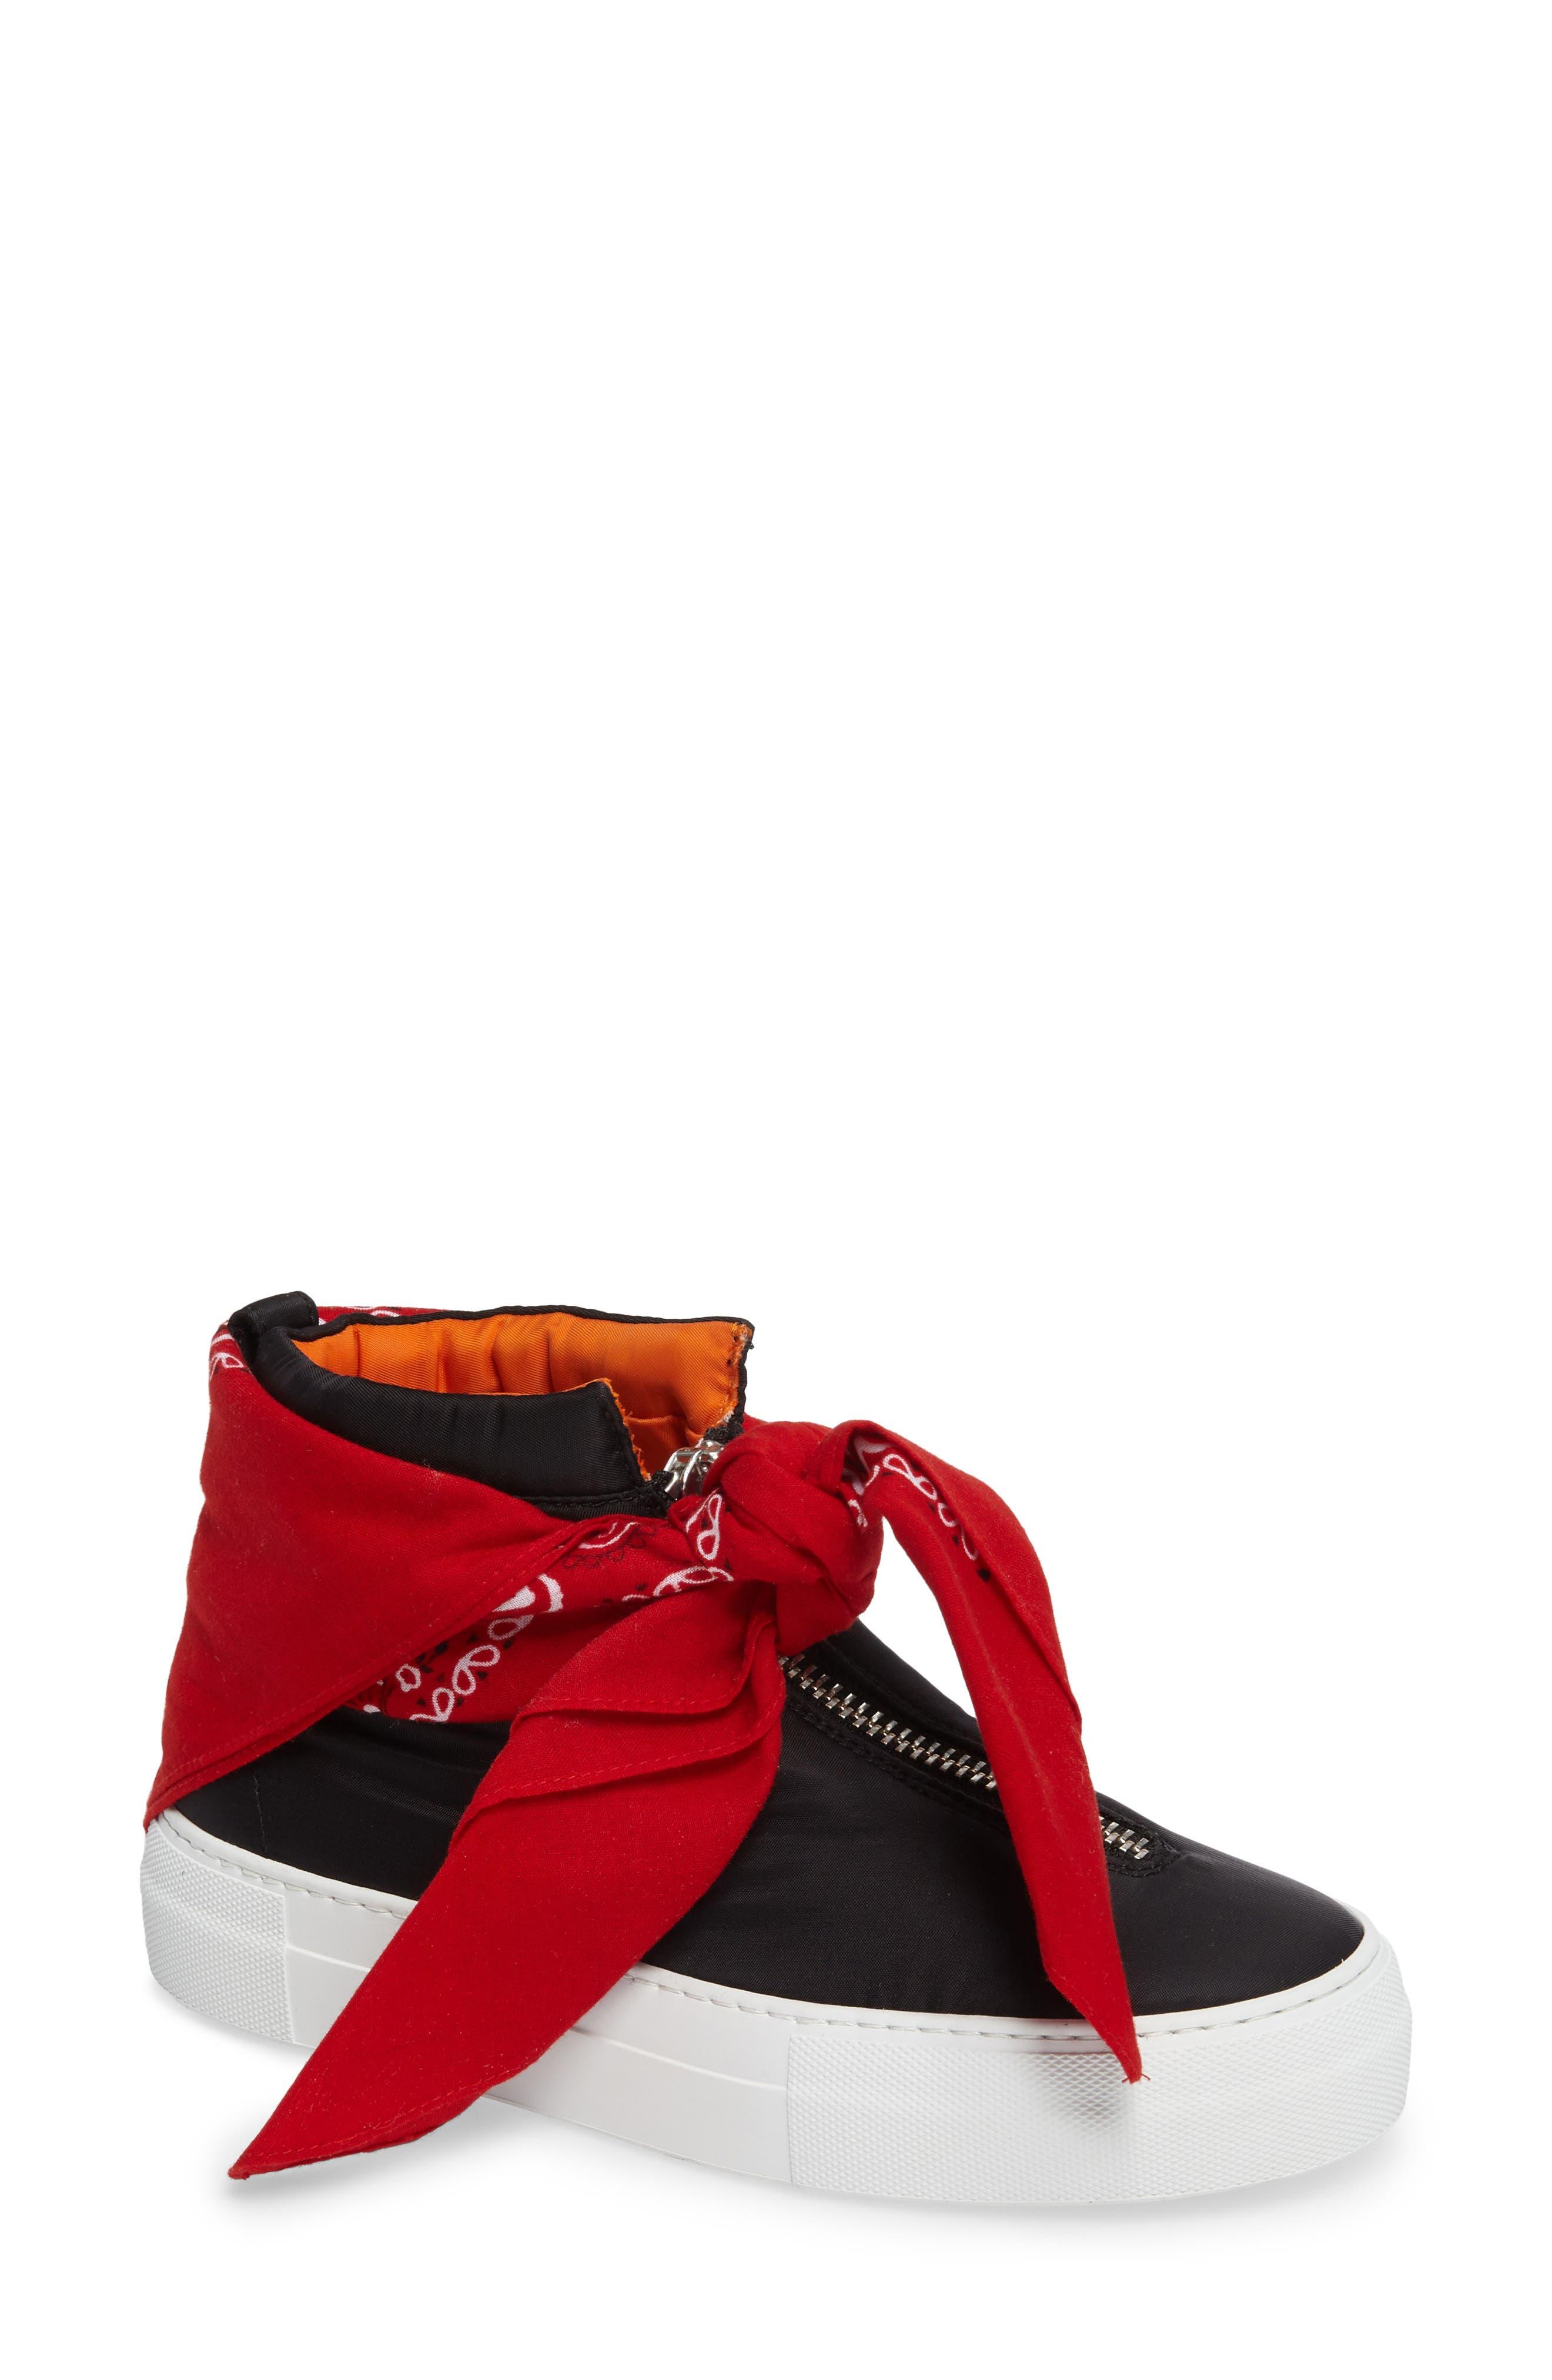 Alternate Image 1 Selected - Joshua Sanders Bandana High Top Sneaker (Women)